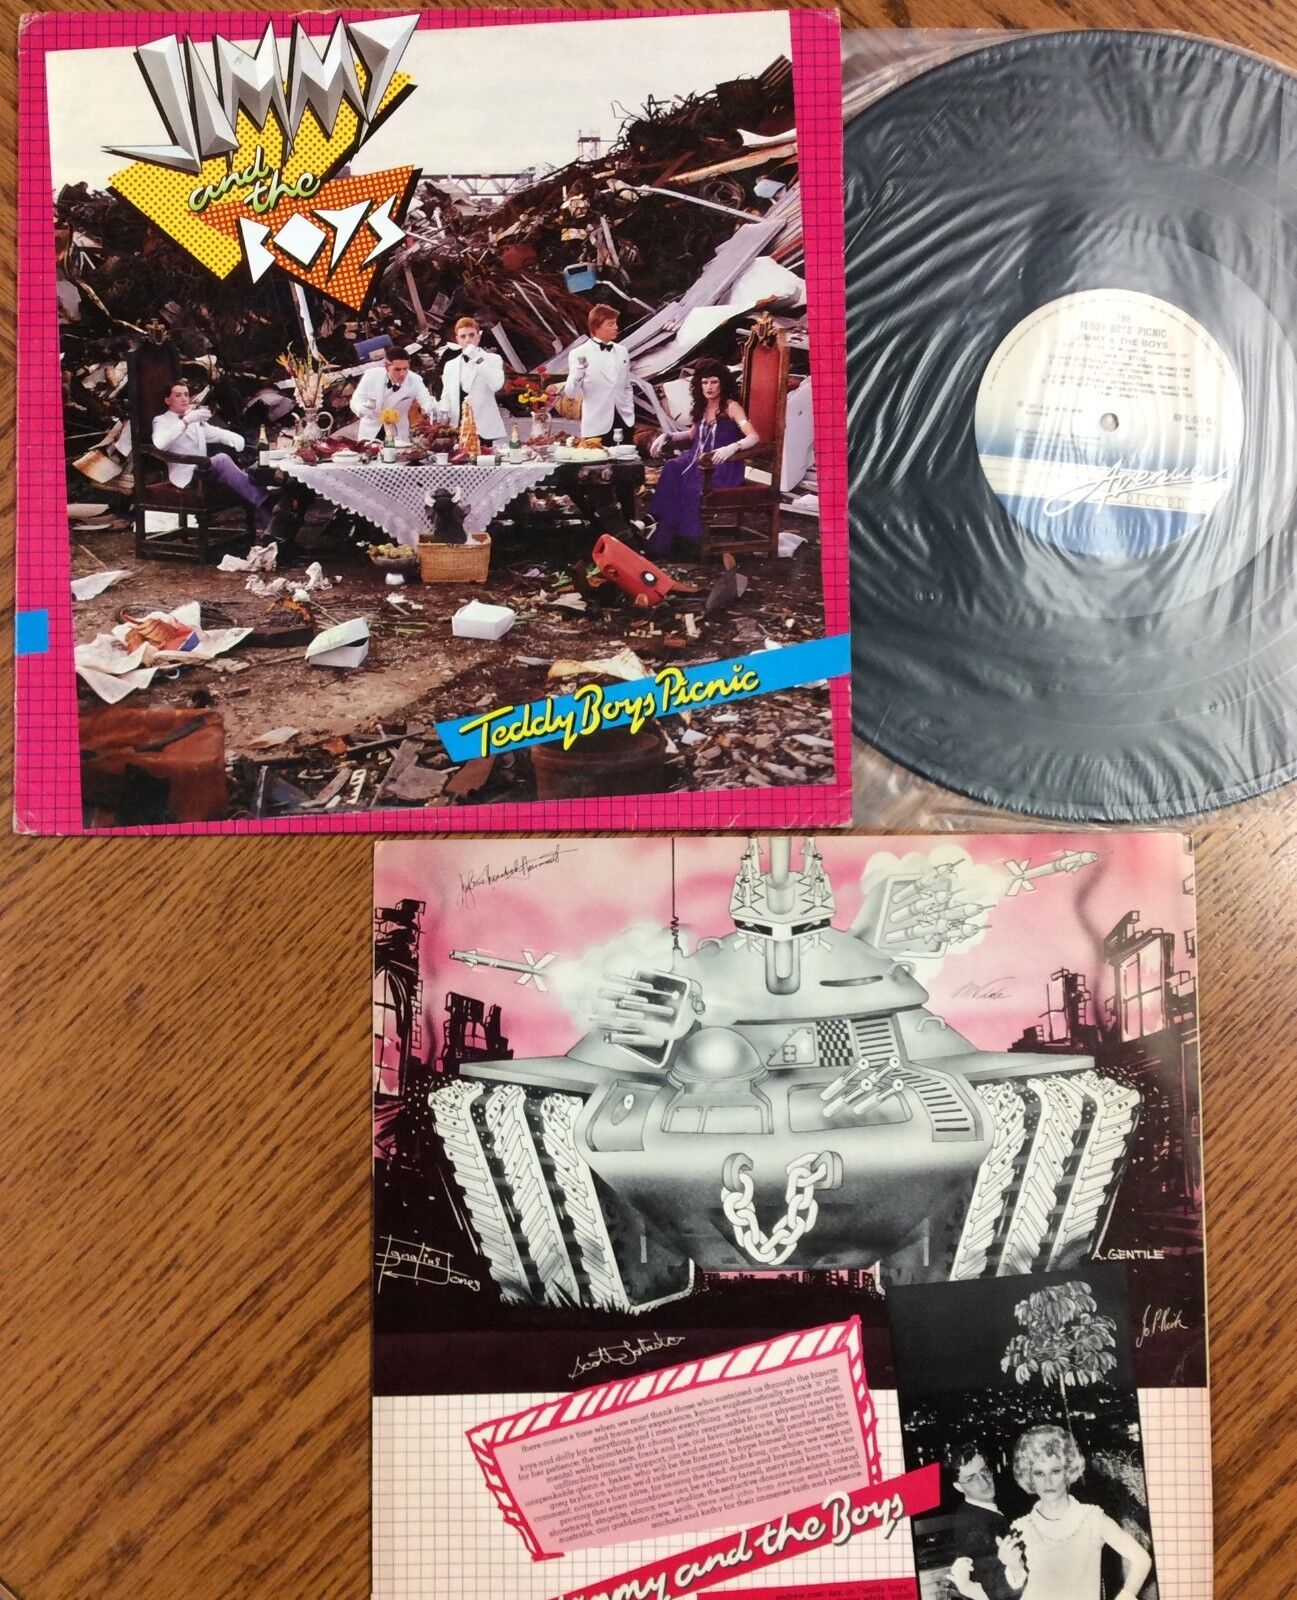 Jimmy And The Boys -Teddy Boys Picnic, Australian Avenue Records RML-53005 - $9.99